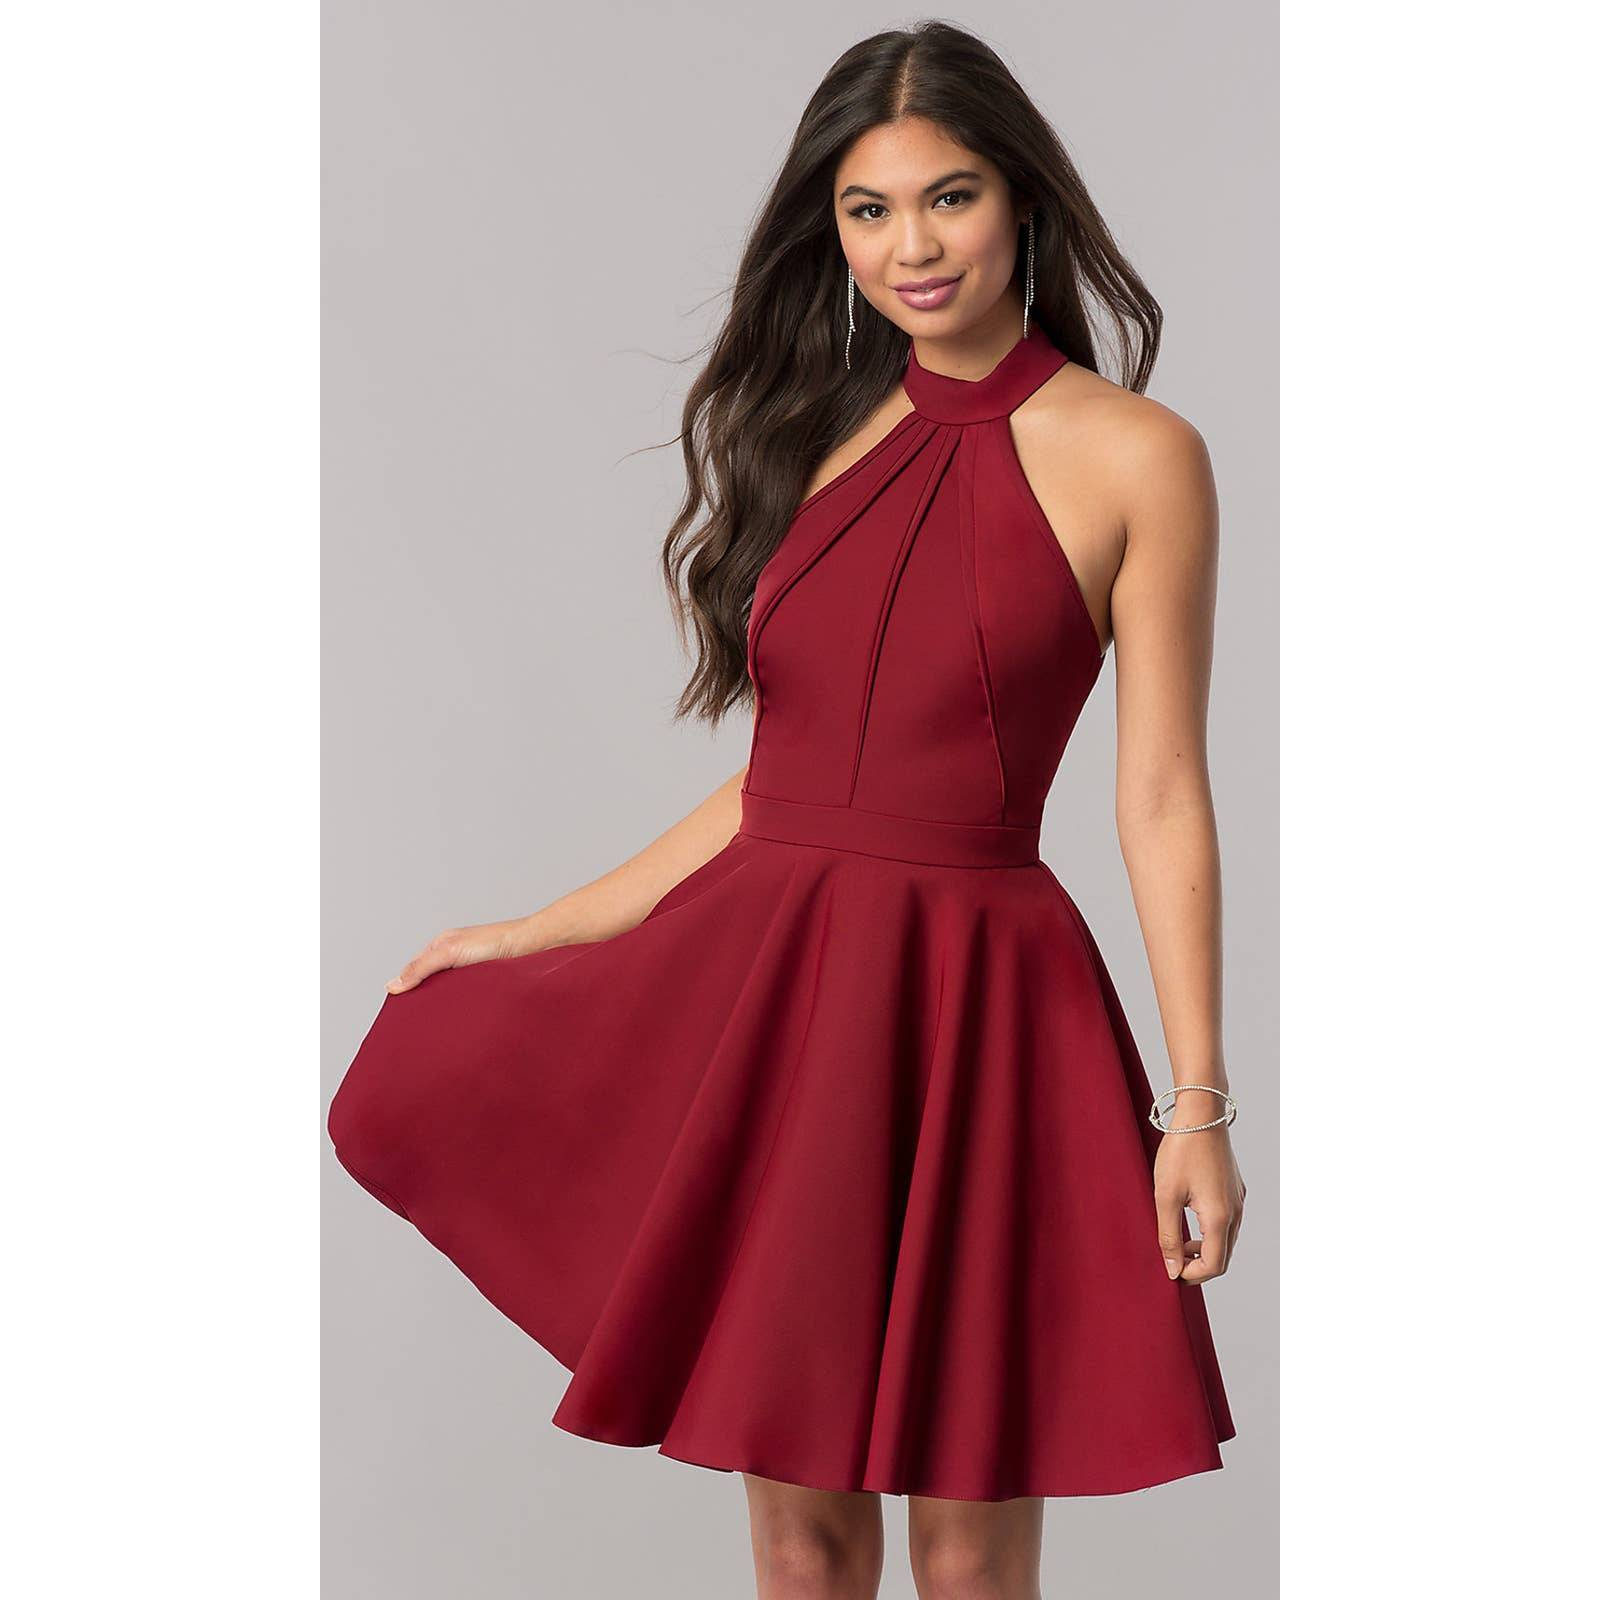 NWT Sherri Hill SH-S51469 Halter Dress